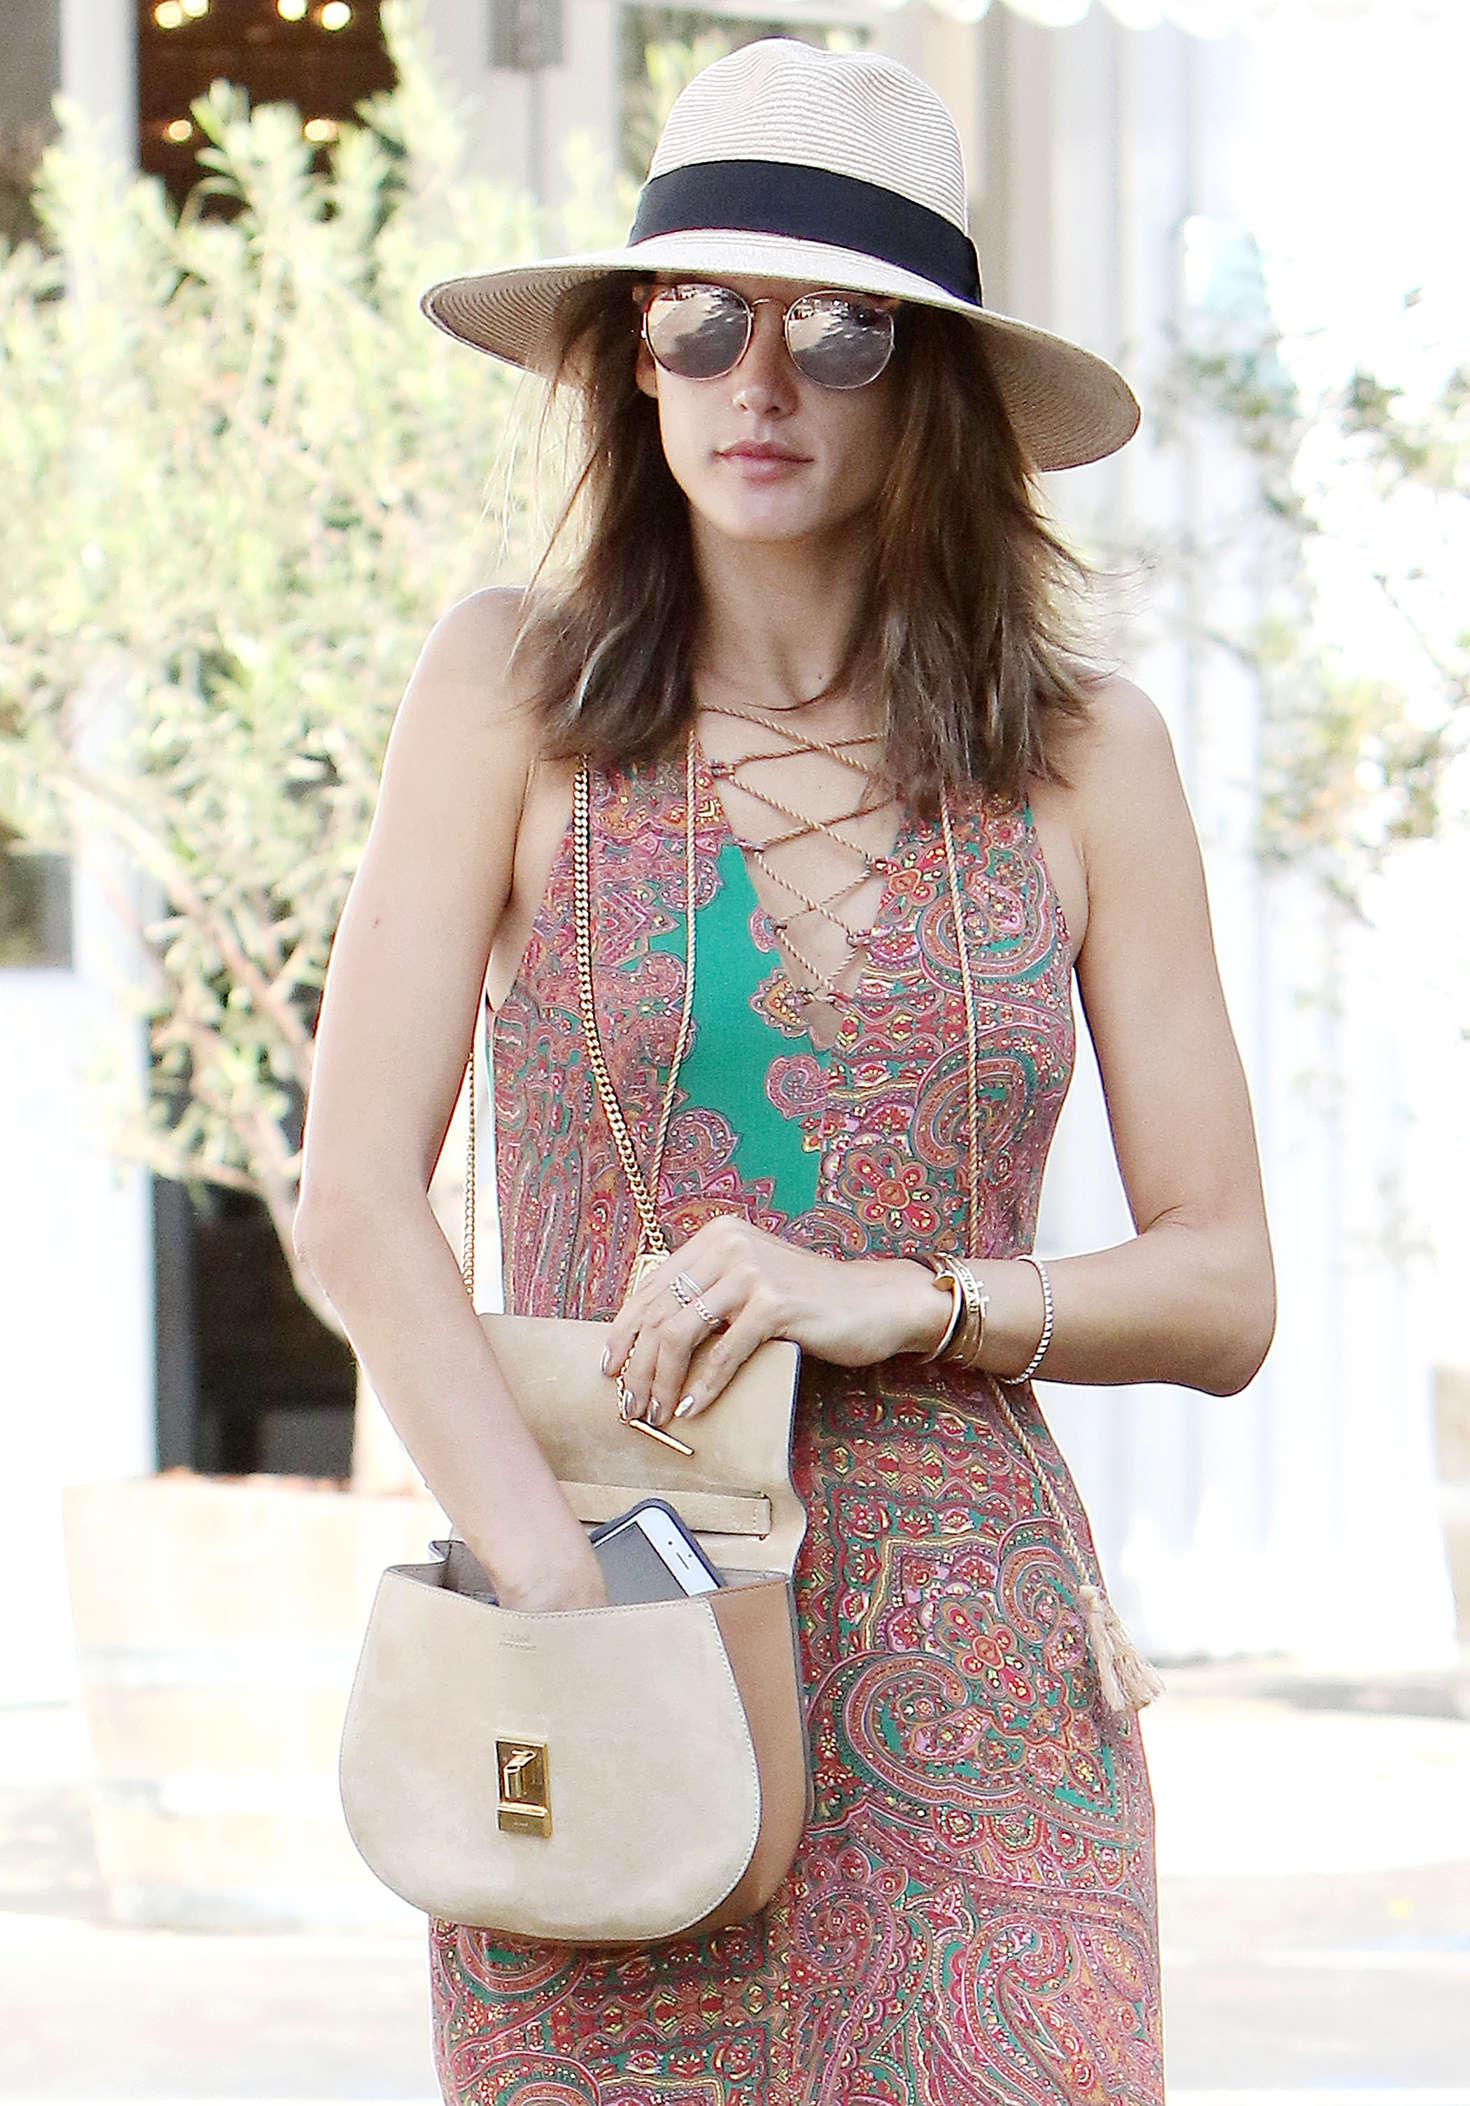 Alessandra Ambrosio 2016 : Alessandra Ambrosio in Long Summer Dress -08